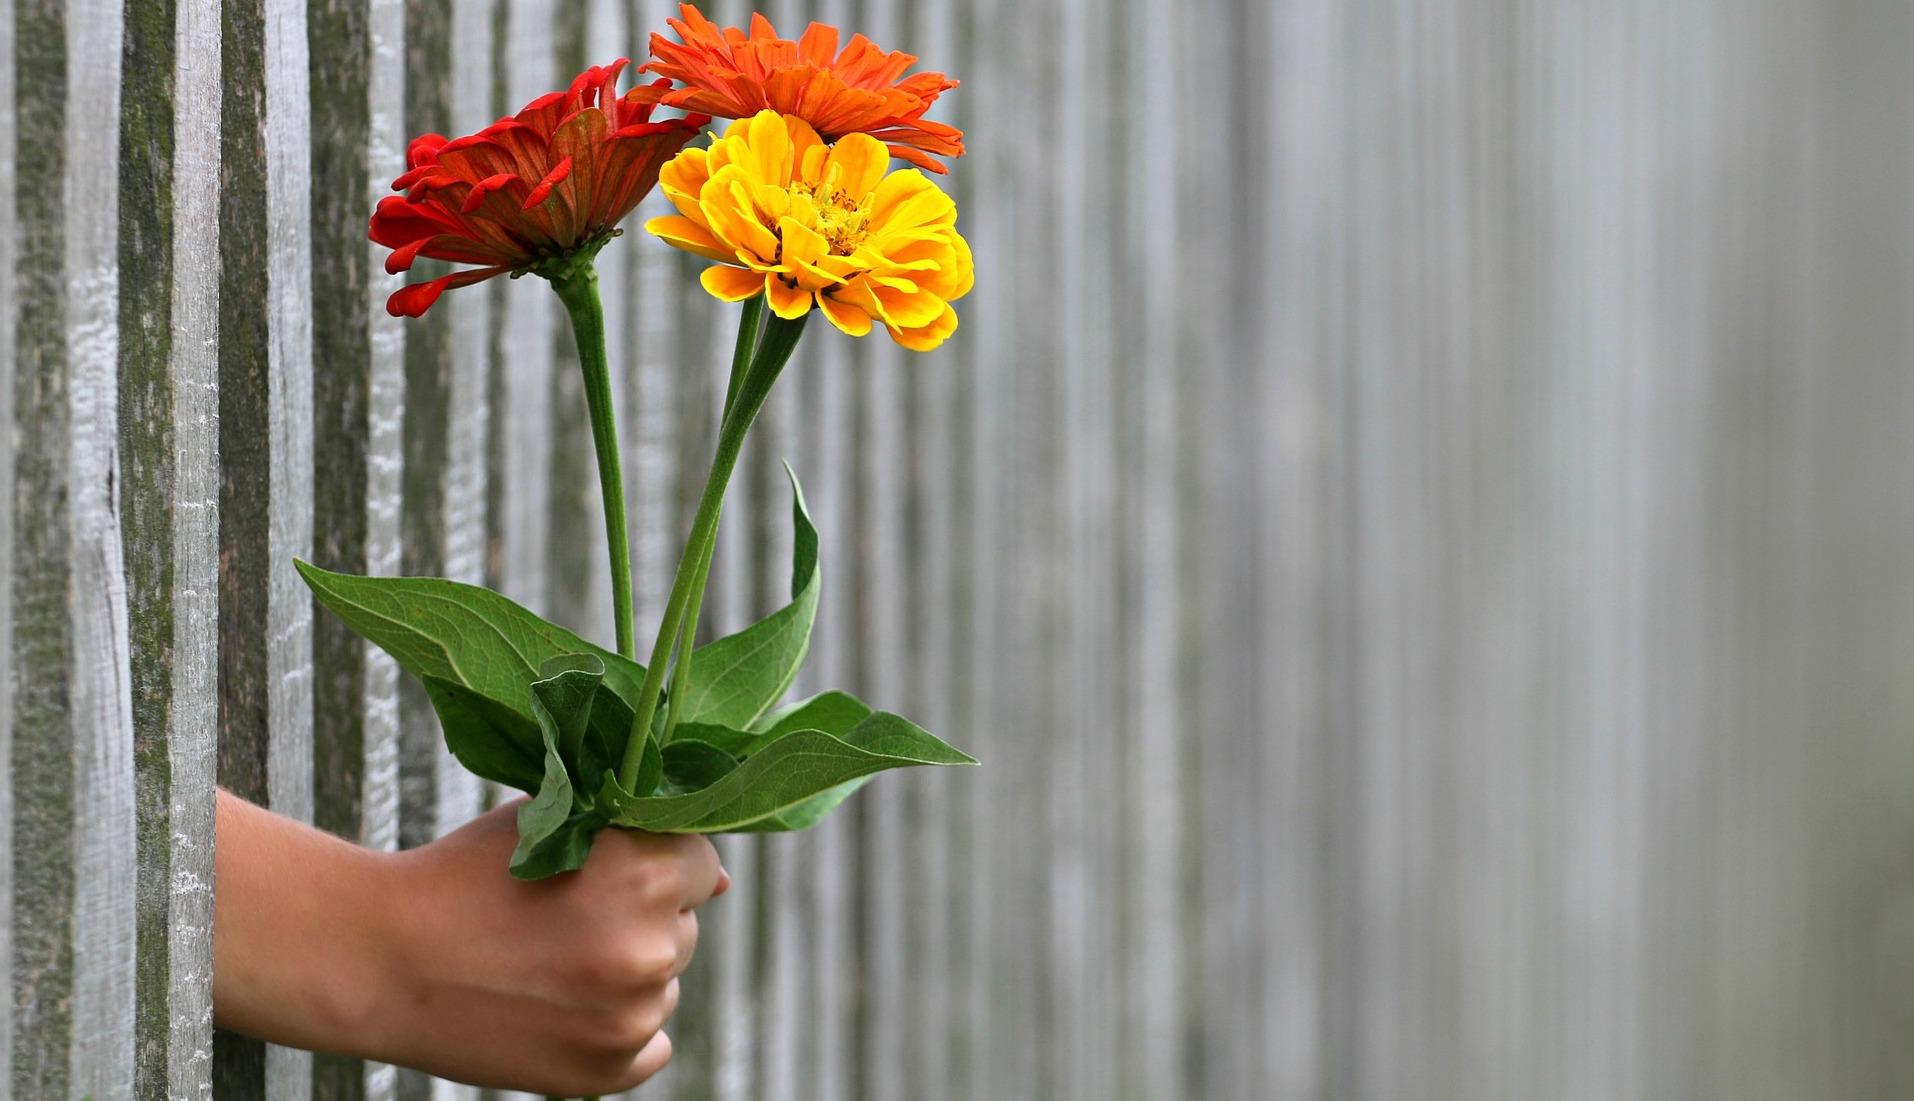 fence flowers hand-1549399_1920 pixabay crop